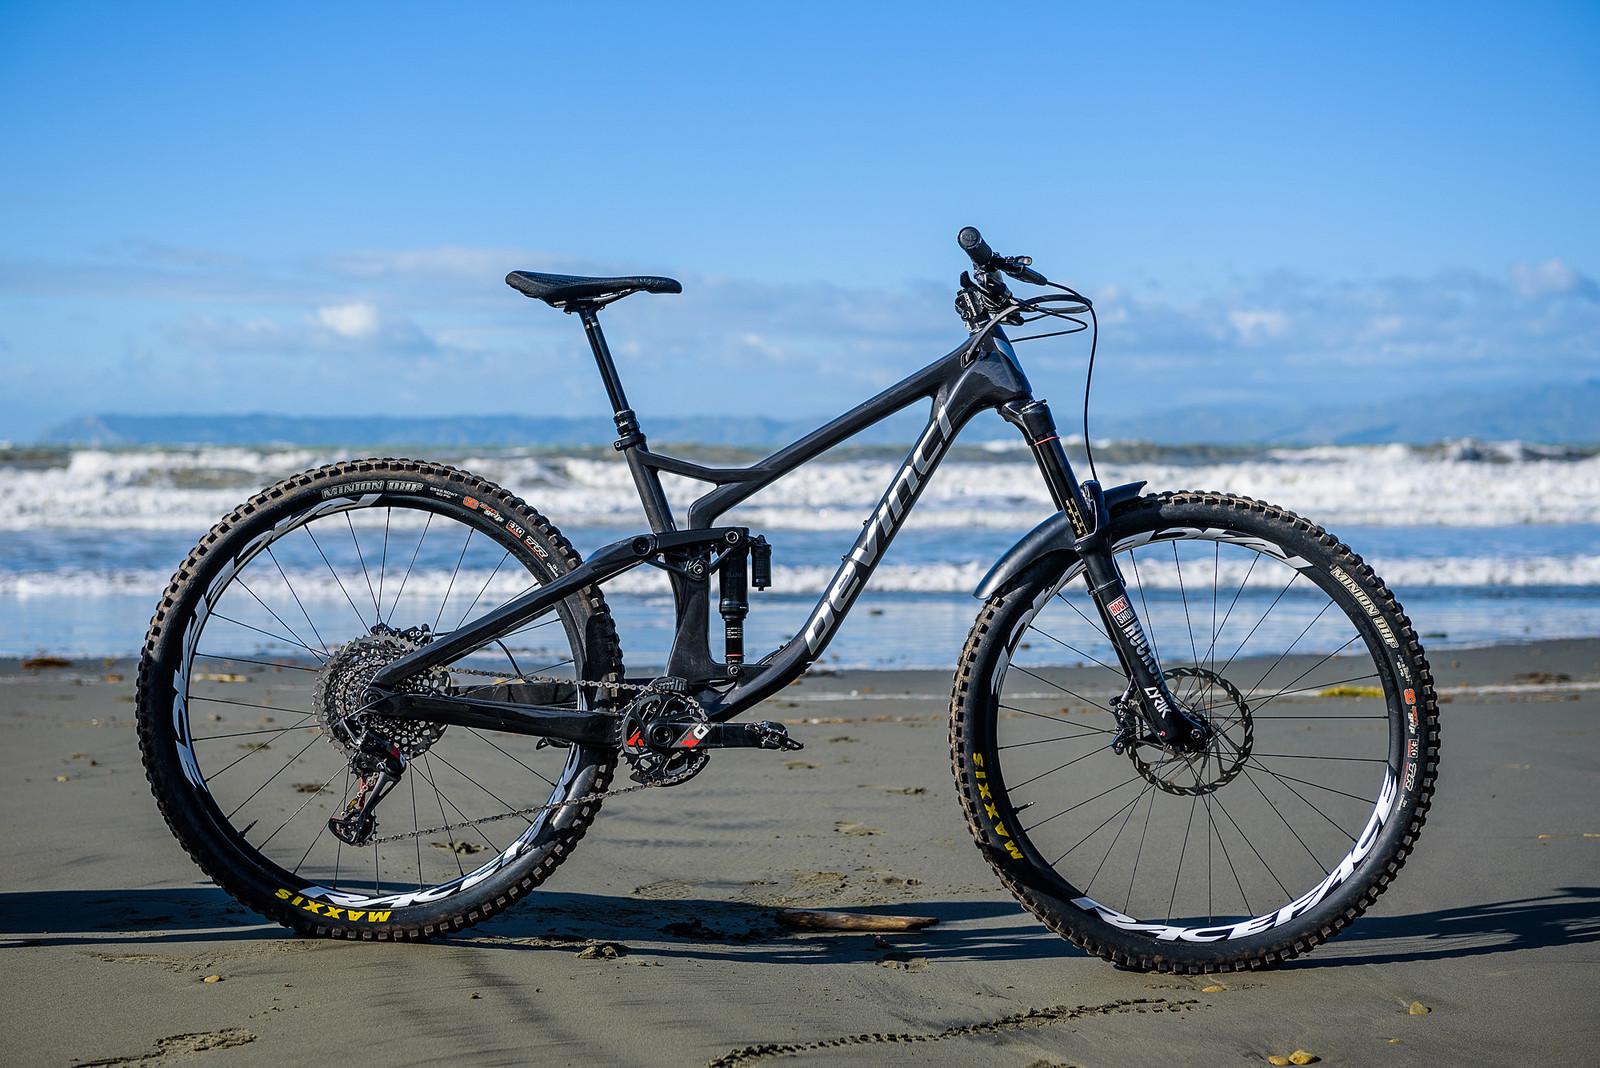 Keegan Wright's Prototype Devinci 29er Enduro Machine - Keegan Wright's Prototype Devinci 29er Enduro Machine - Mountain Biking Pictures - Vital MTB